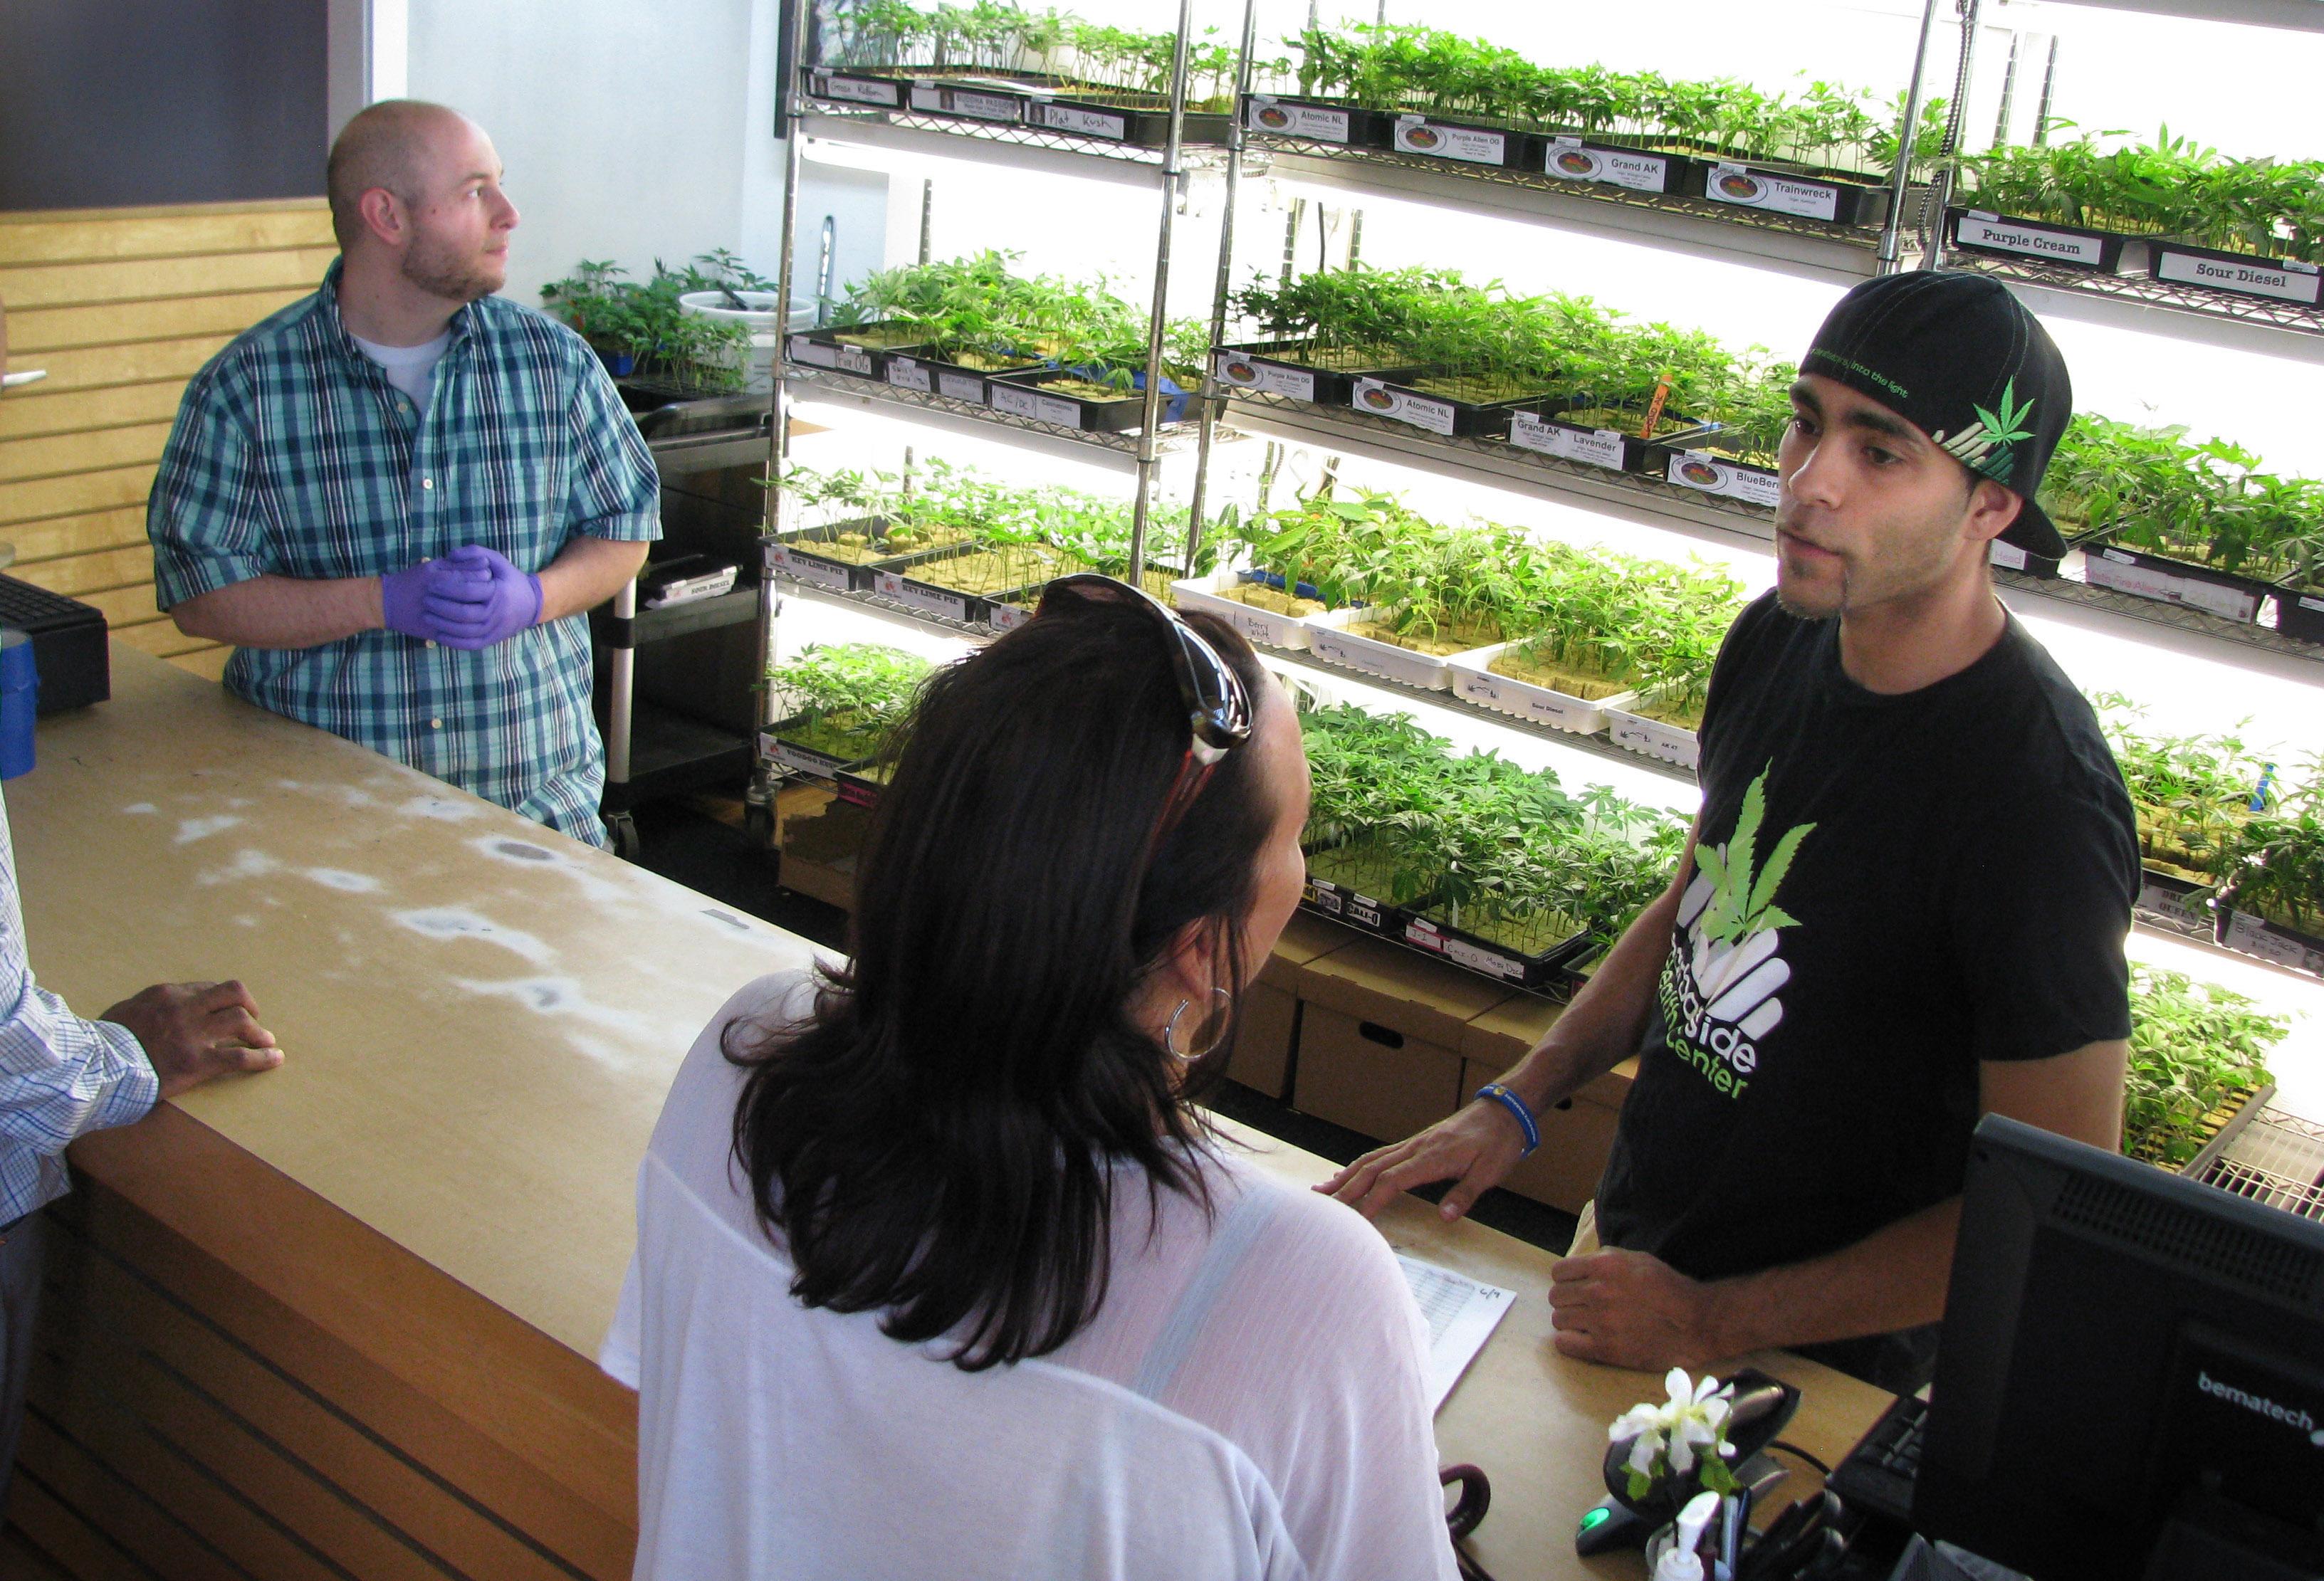 How California's Landmark Medical Marijuana Bill Affects The End User